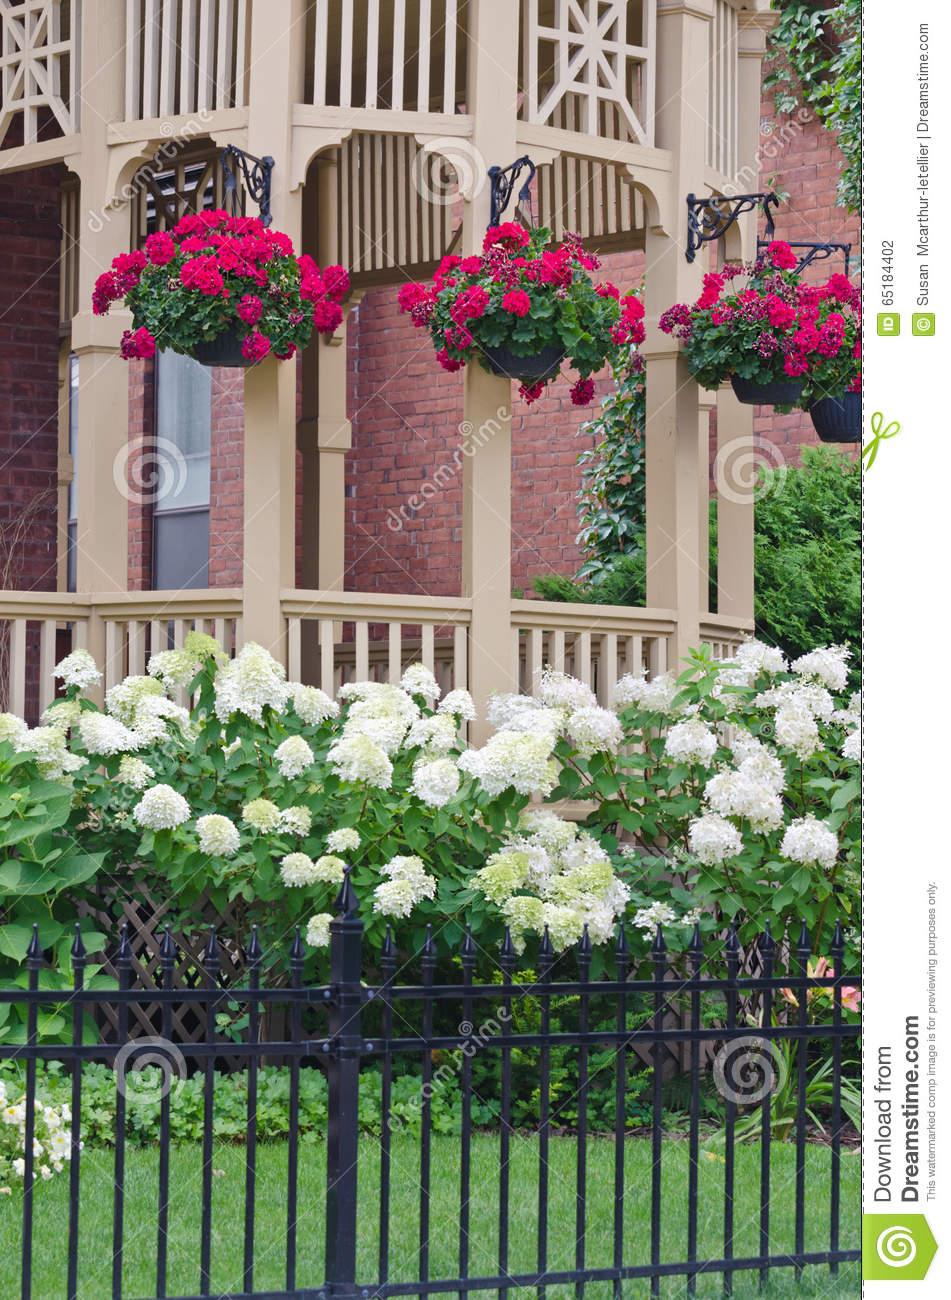 Geranium Plants Hanging From Gazebo Porch With Hydrangea Bushes.